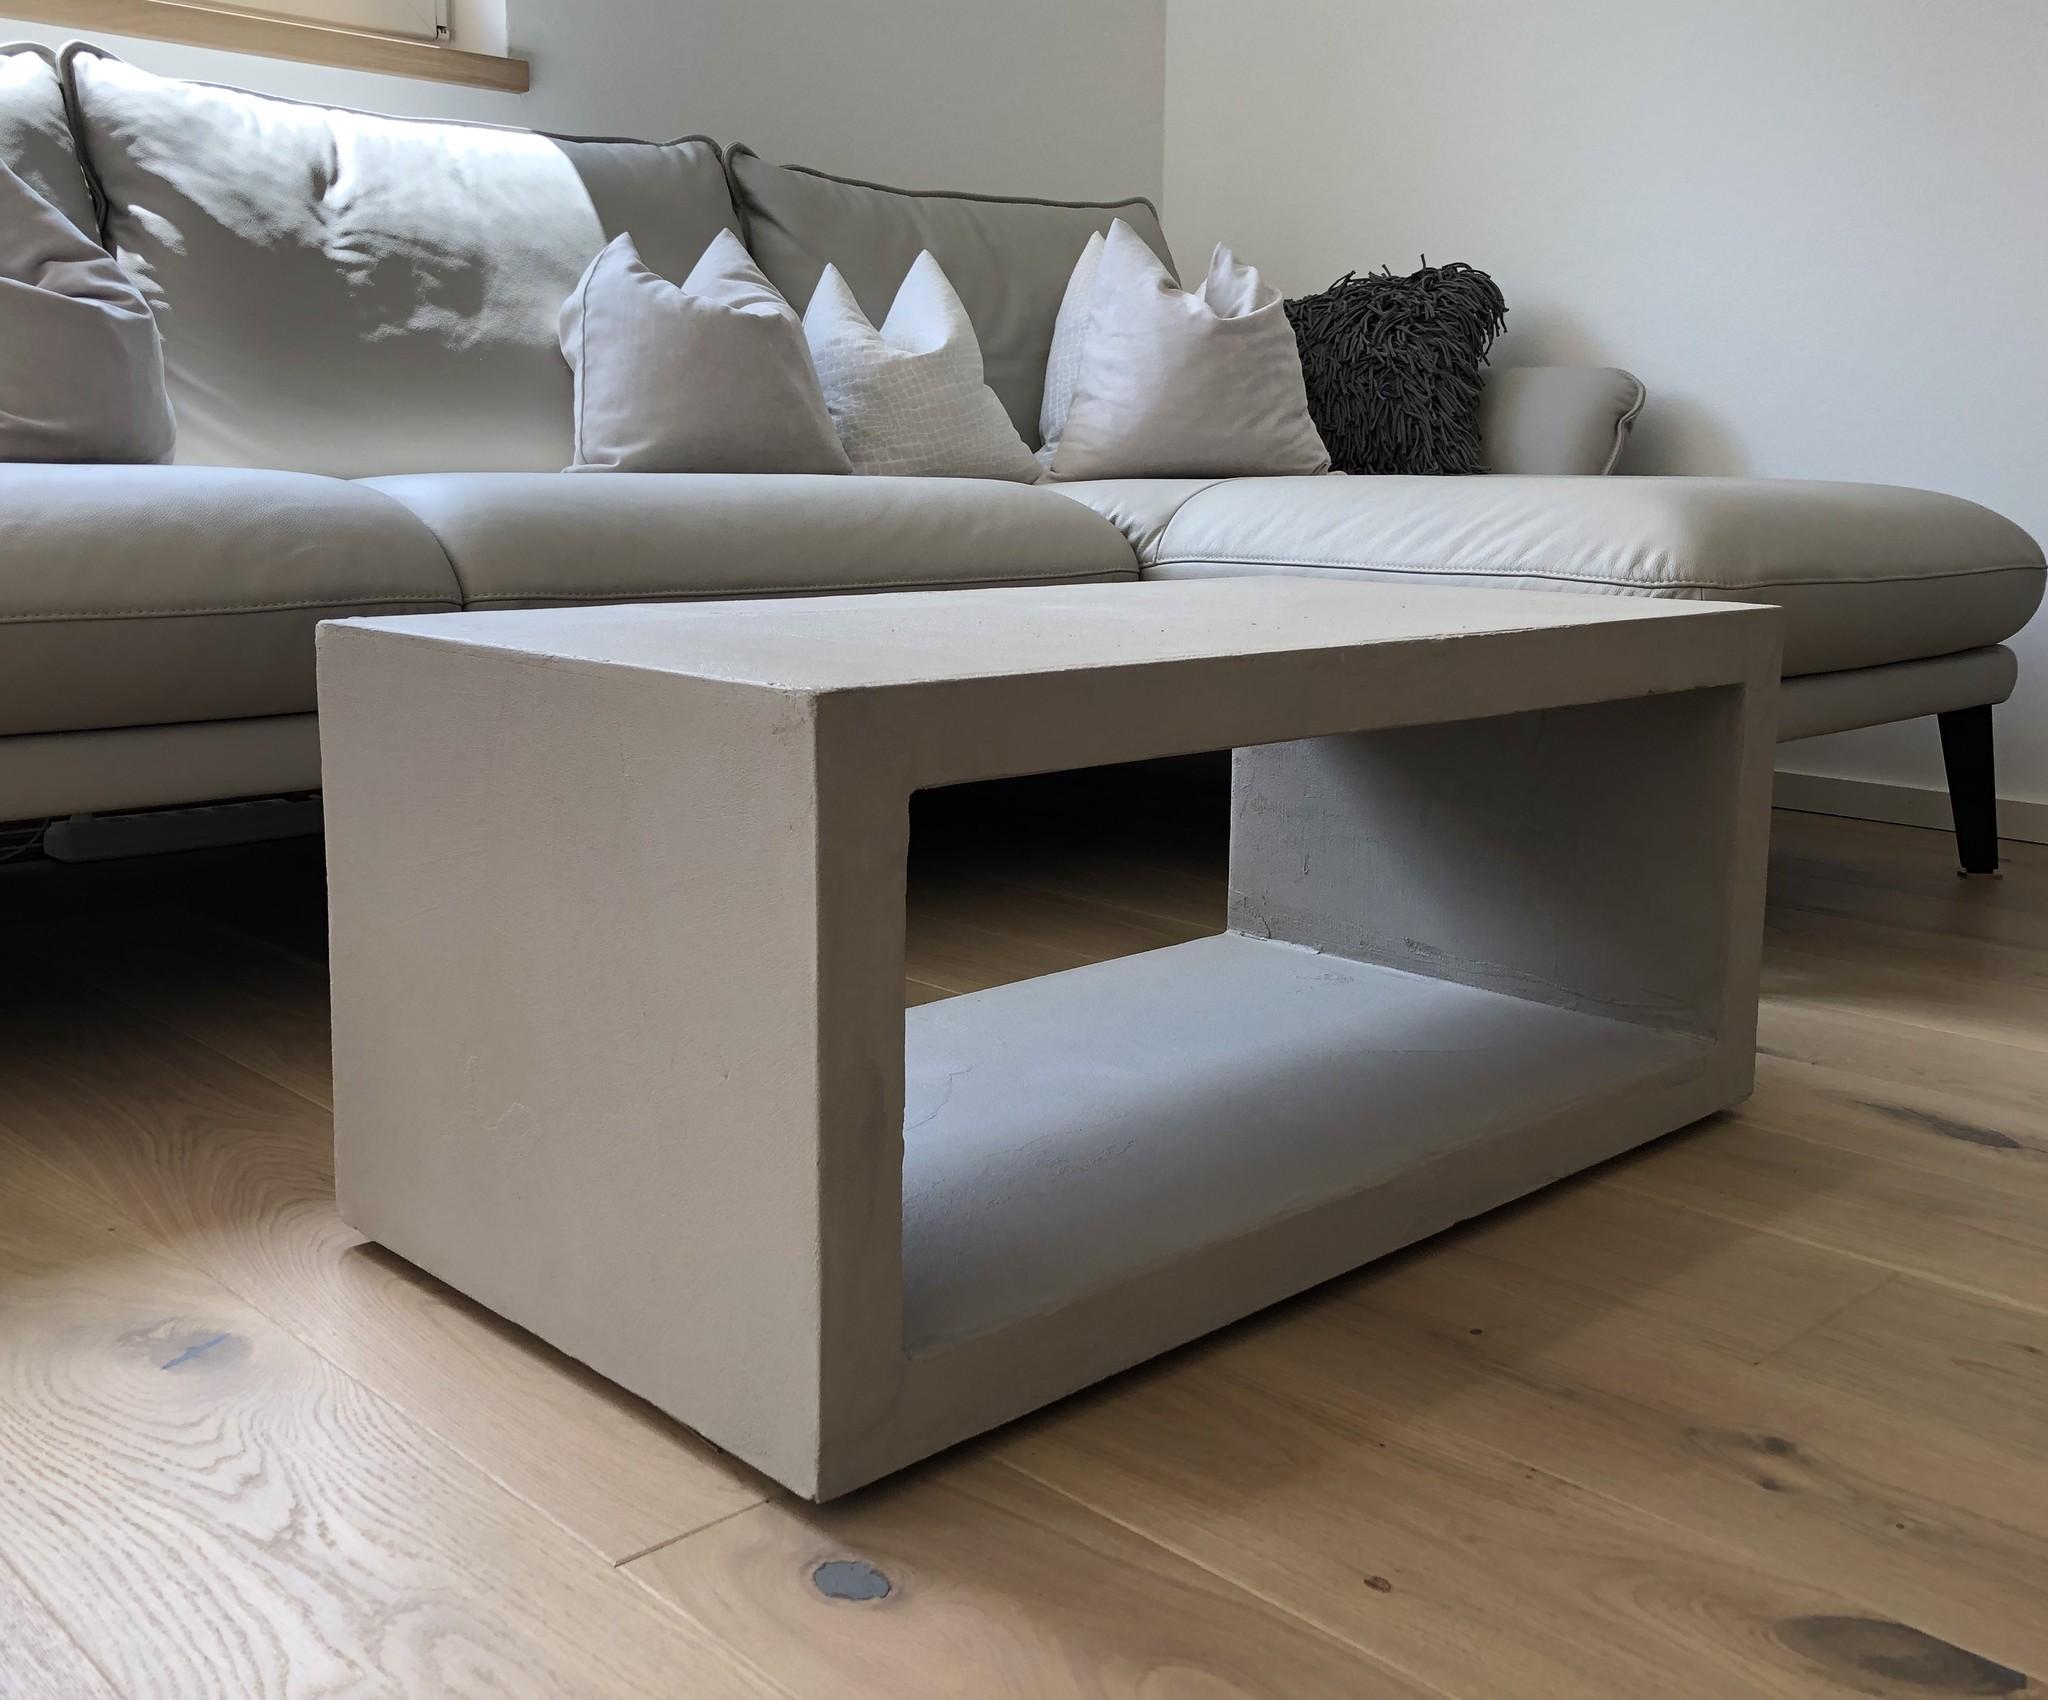 Couchtisch Design Industrial, Beton Cube